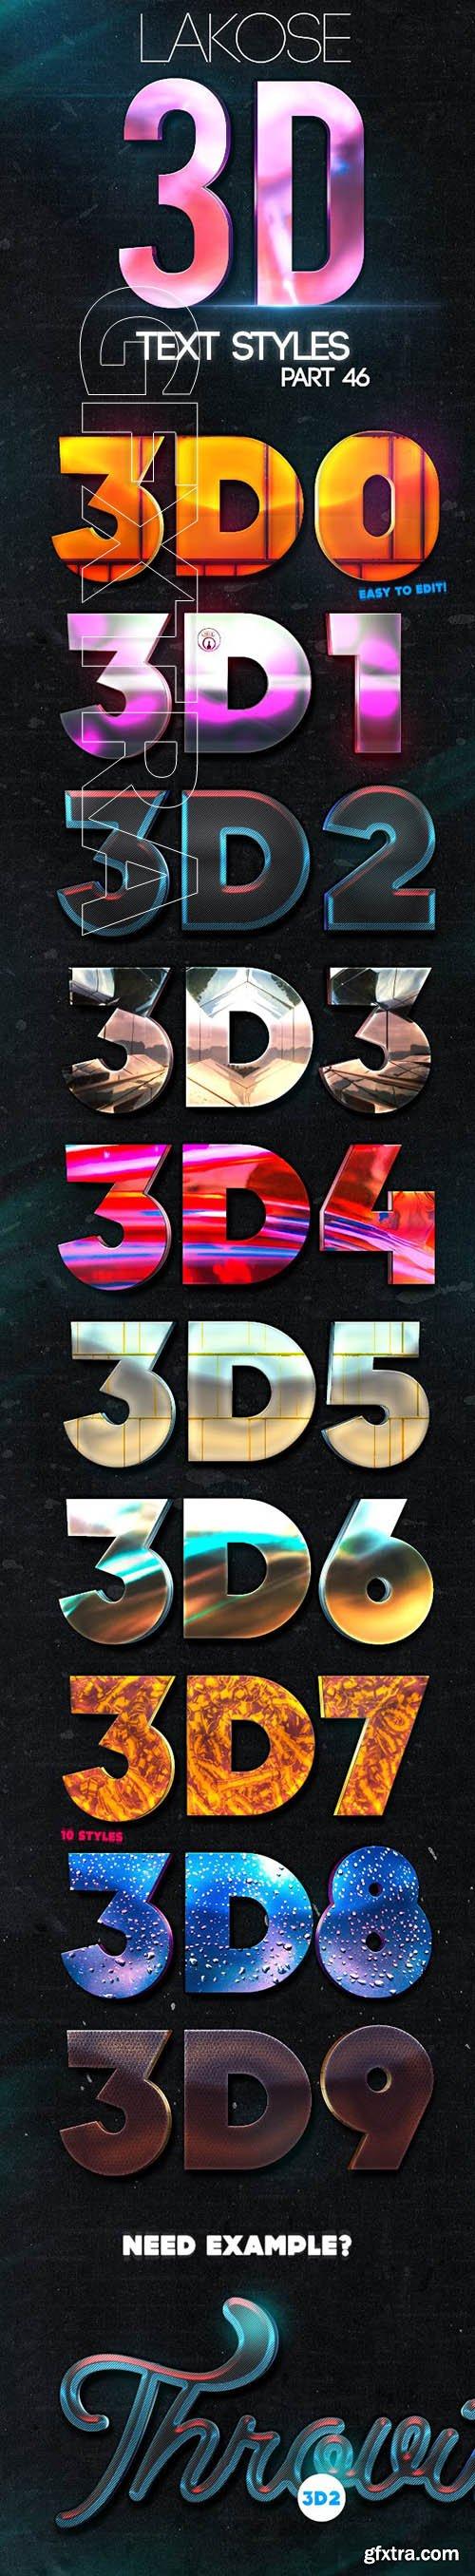 GraphicRiver - Lakose 3D Text Styles Part 46 23661741